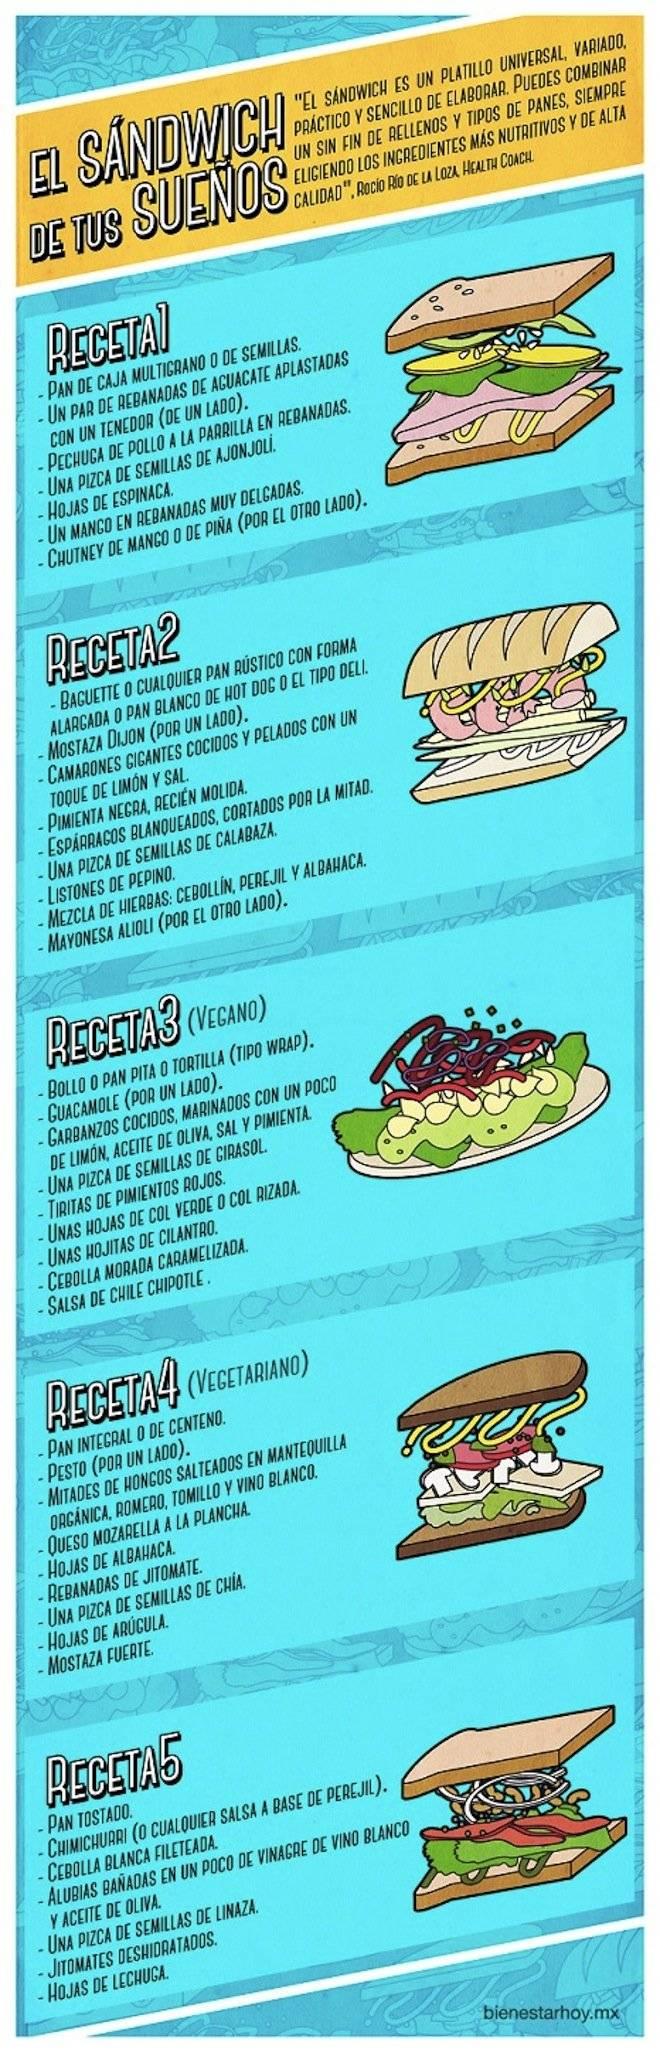 elsandwichfoodrevolutionbaja.jpg